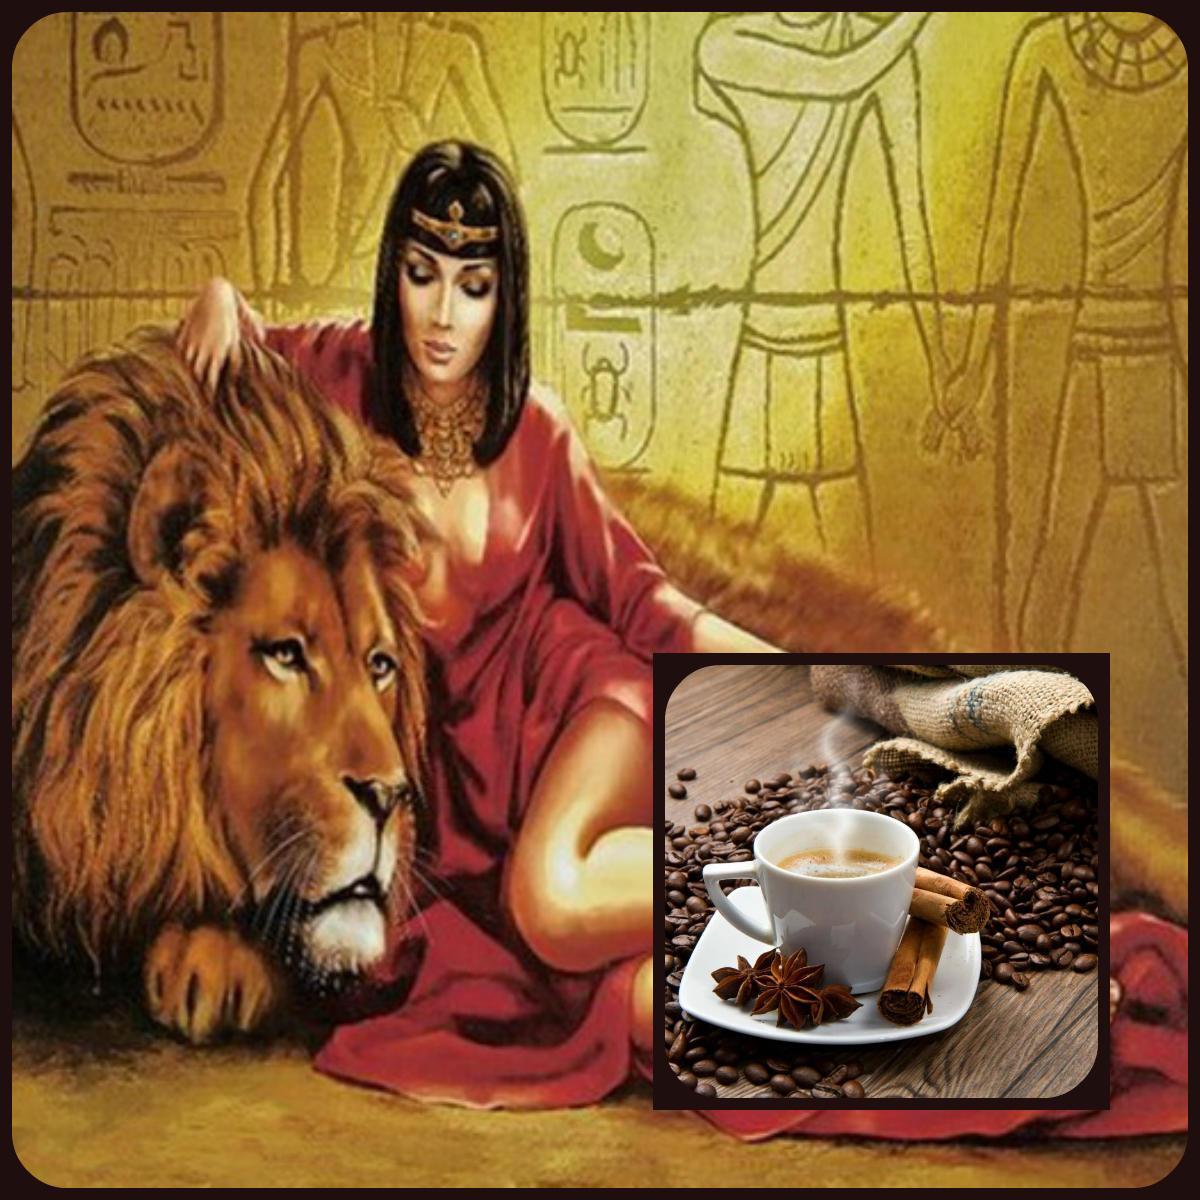 Вечер налил чашку кофе с корицей,  .....